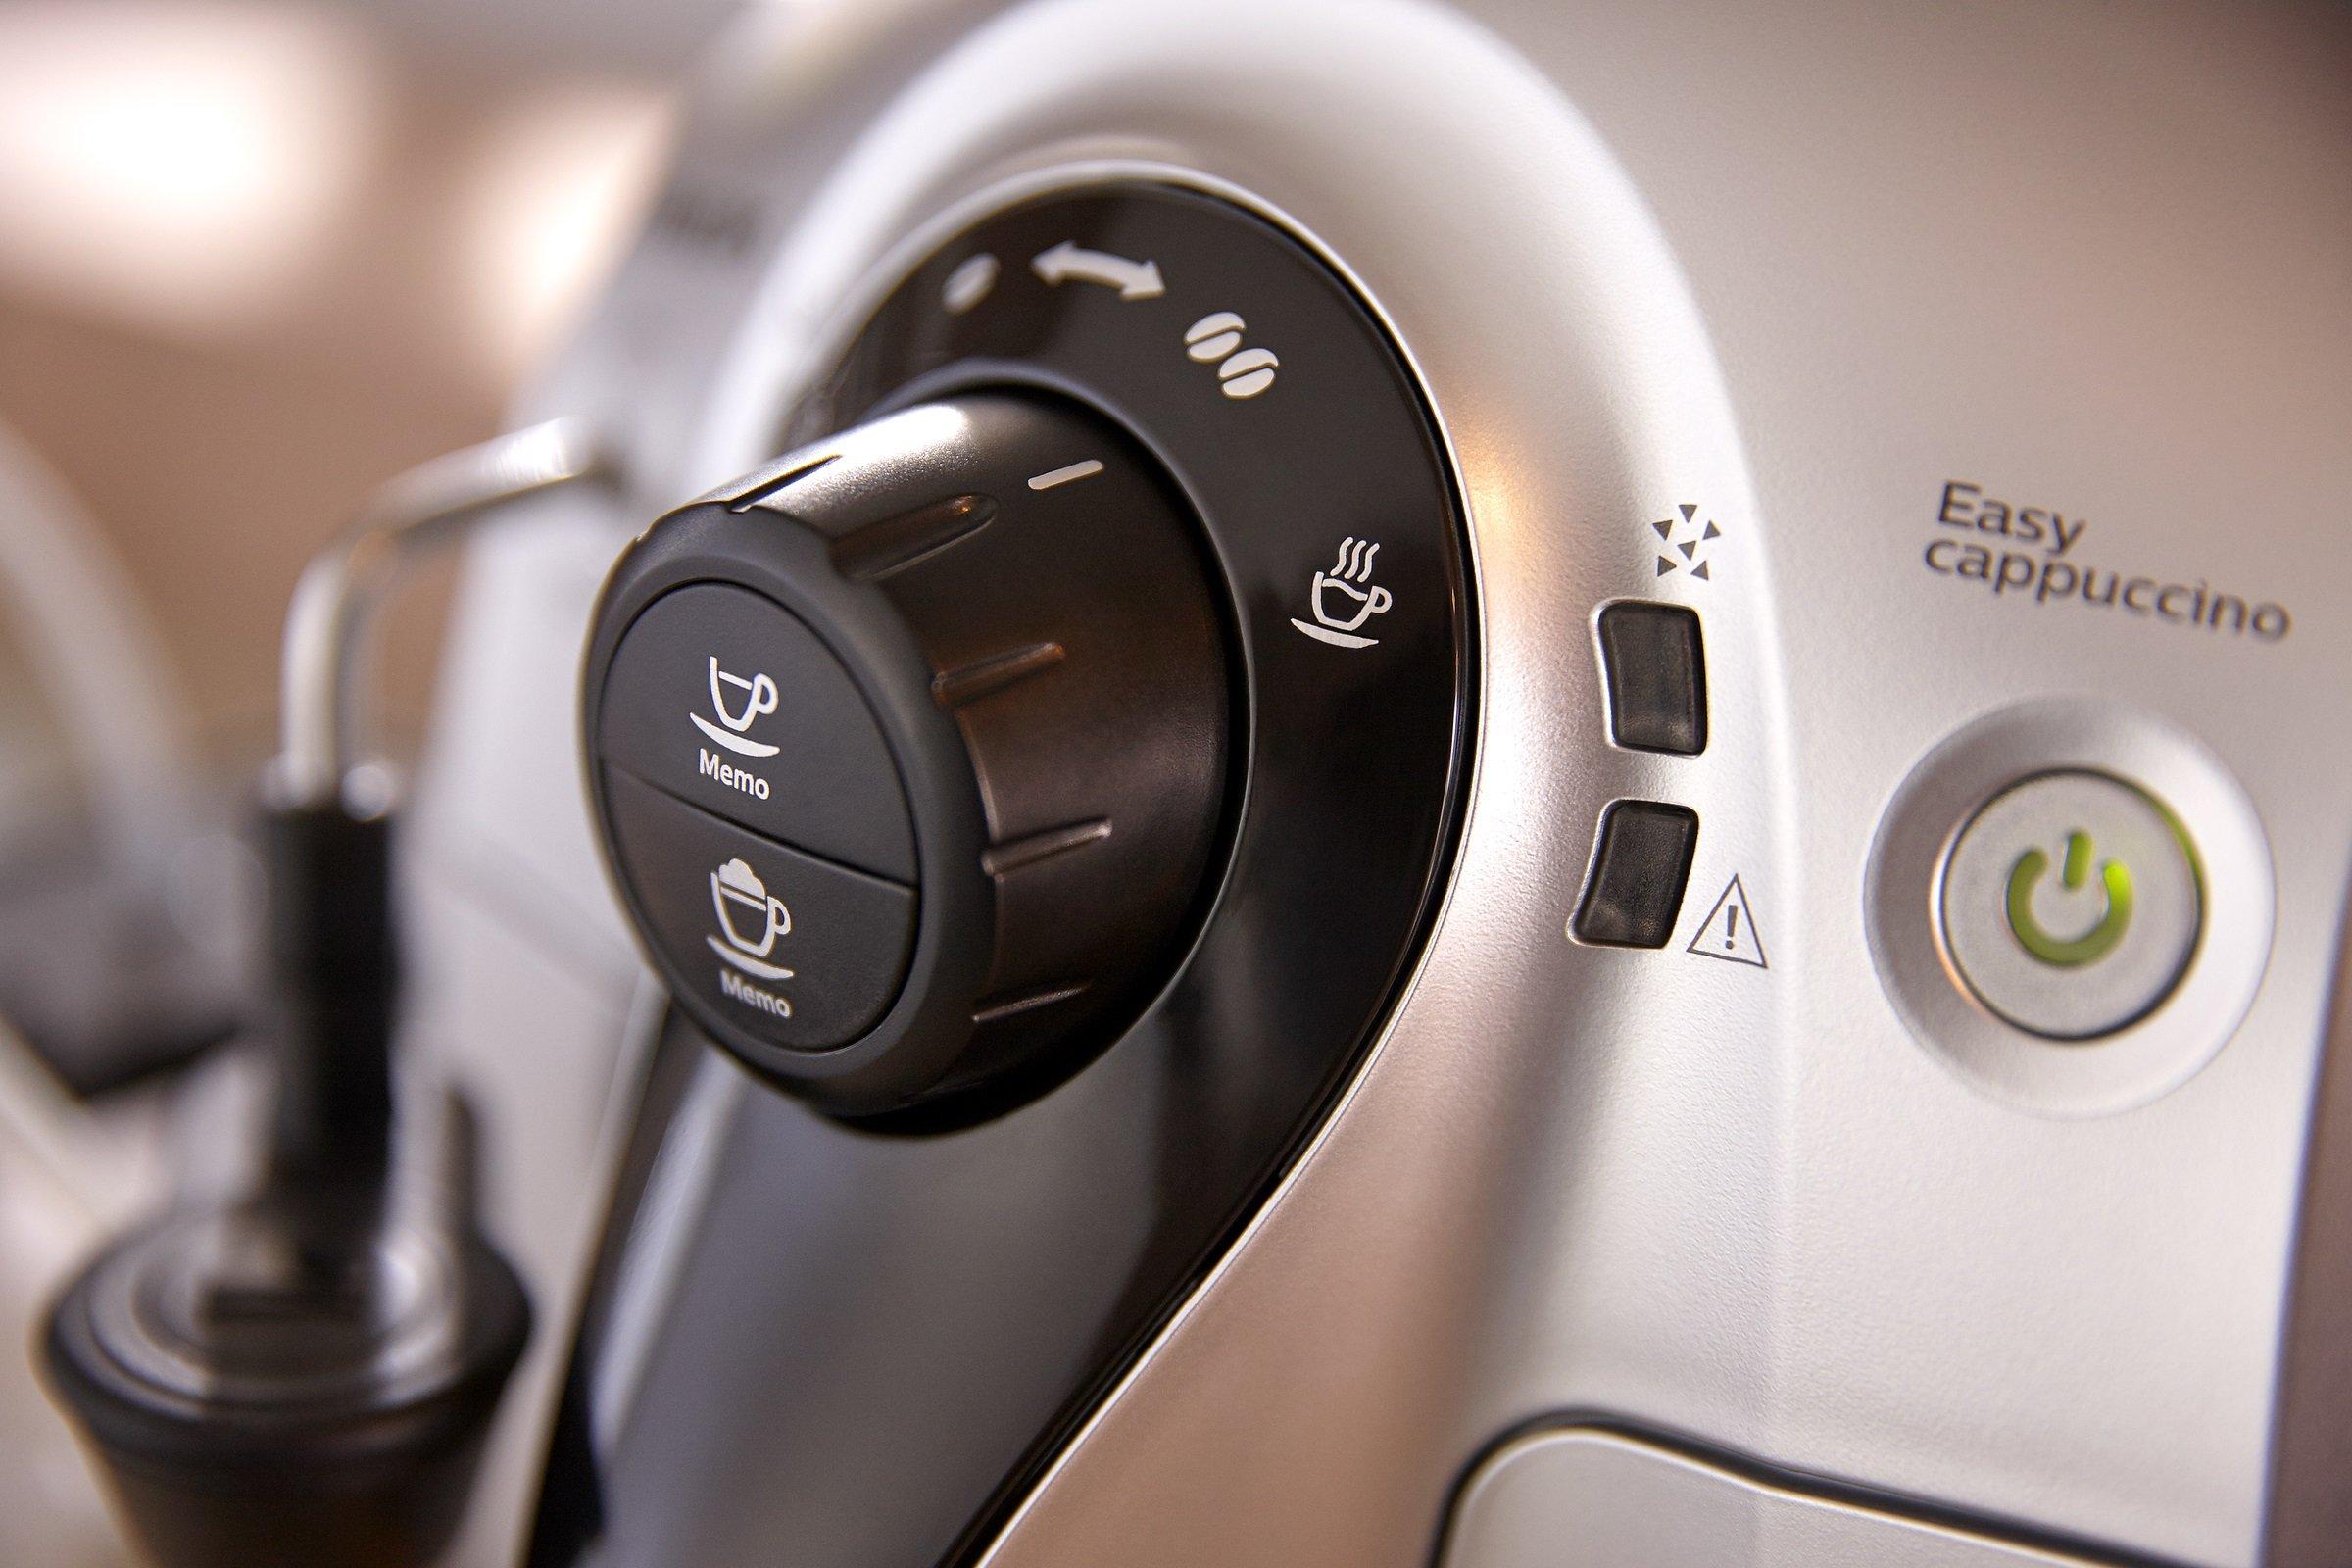 Philips-HD865251-2100-Serie-Kaffeevollautomat-Cappuccino-auf-Knopfdruck-silber